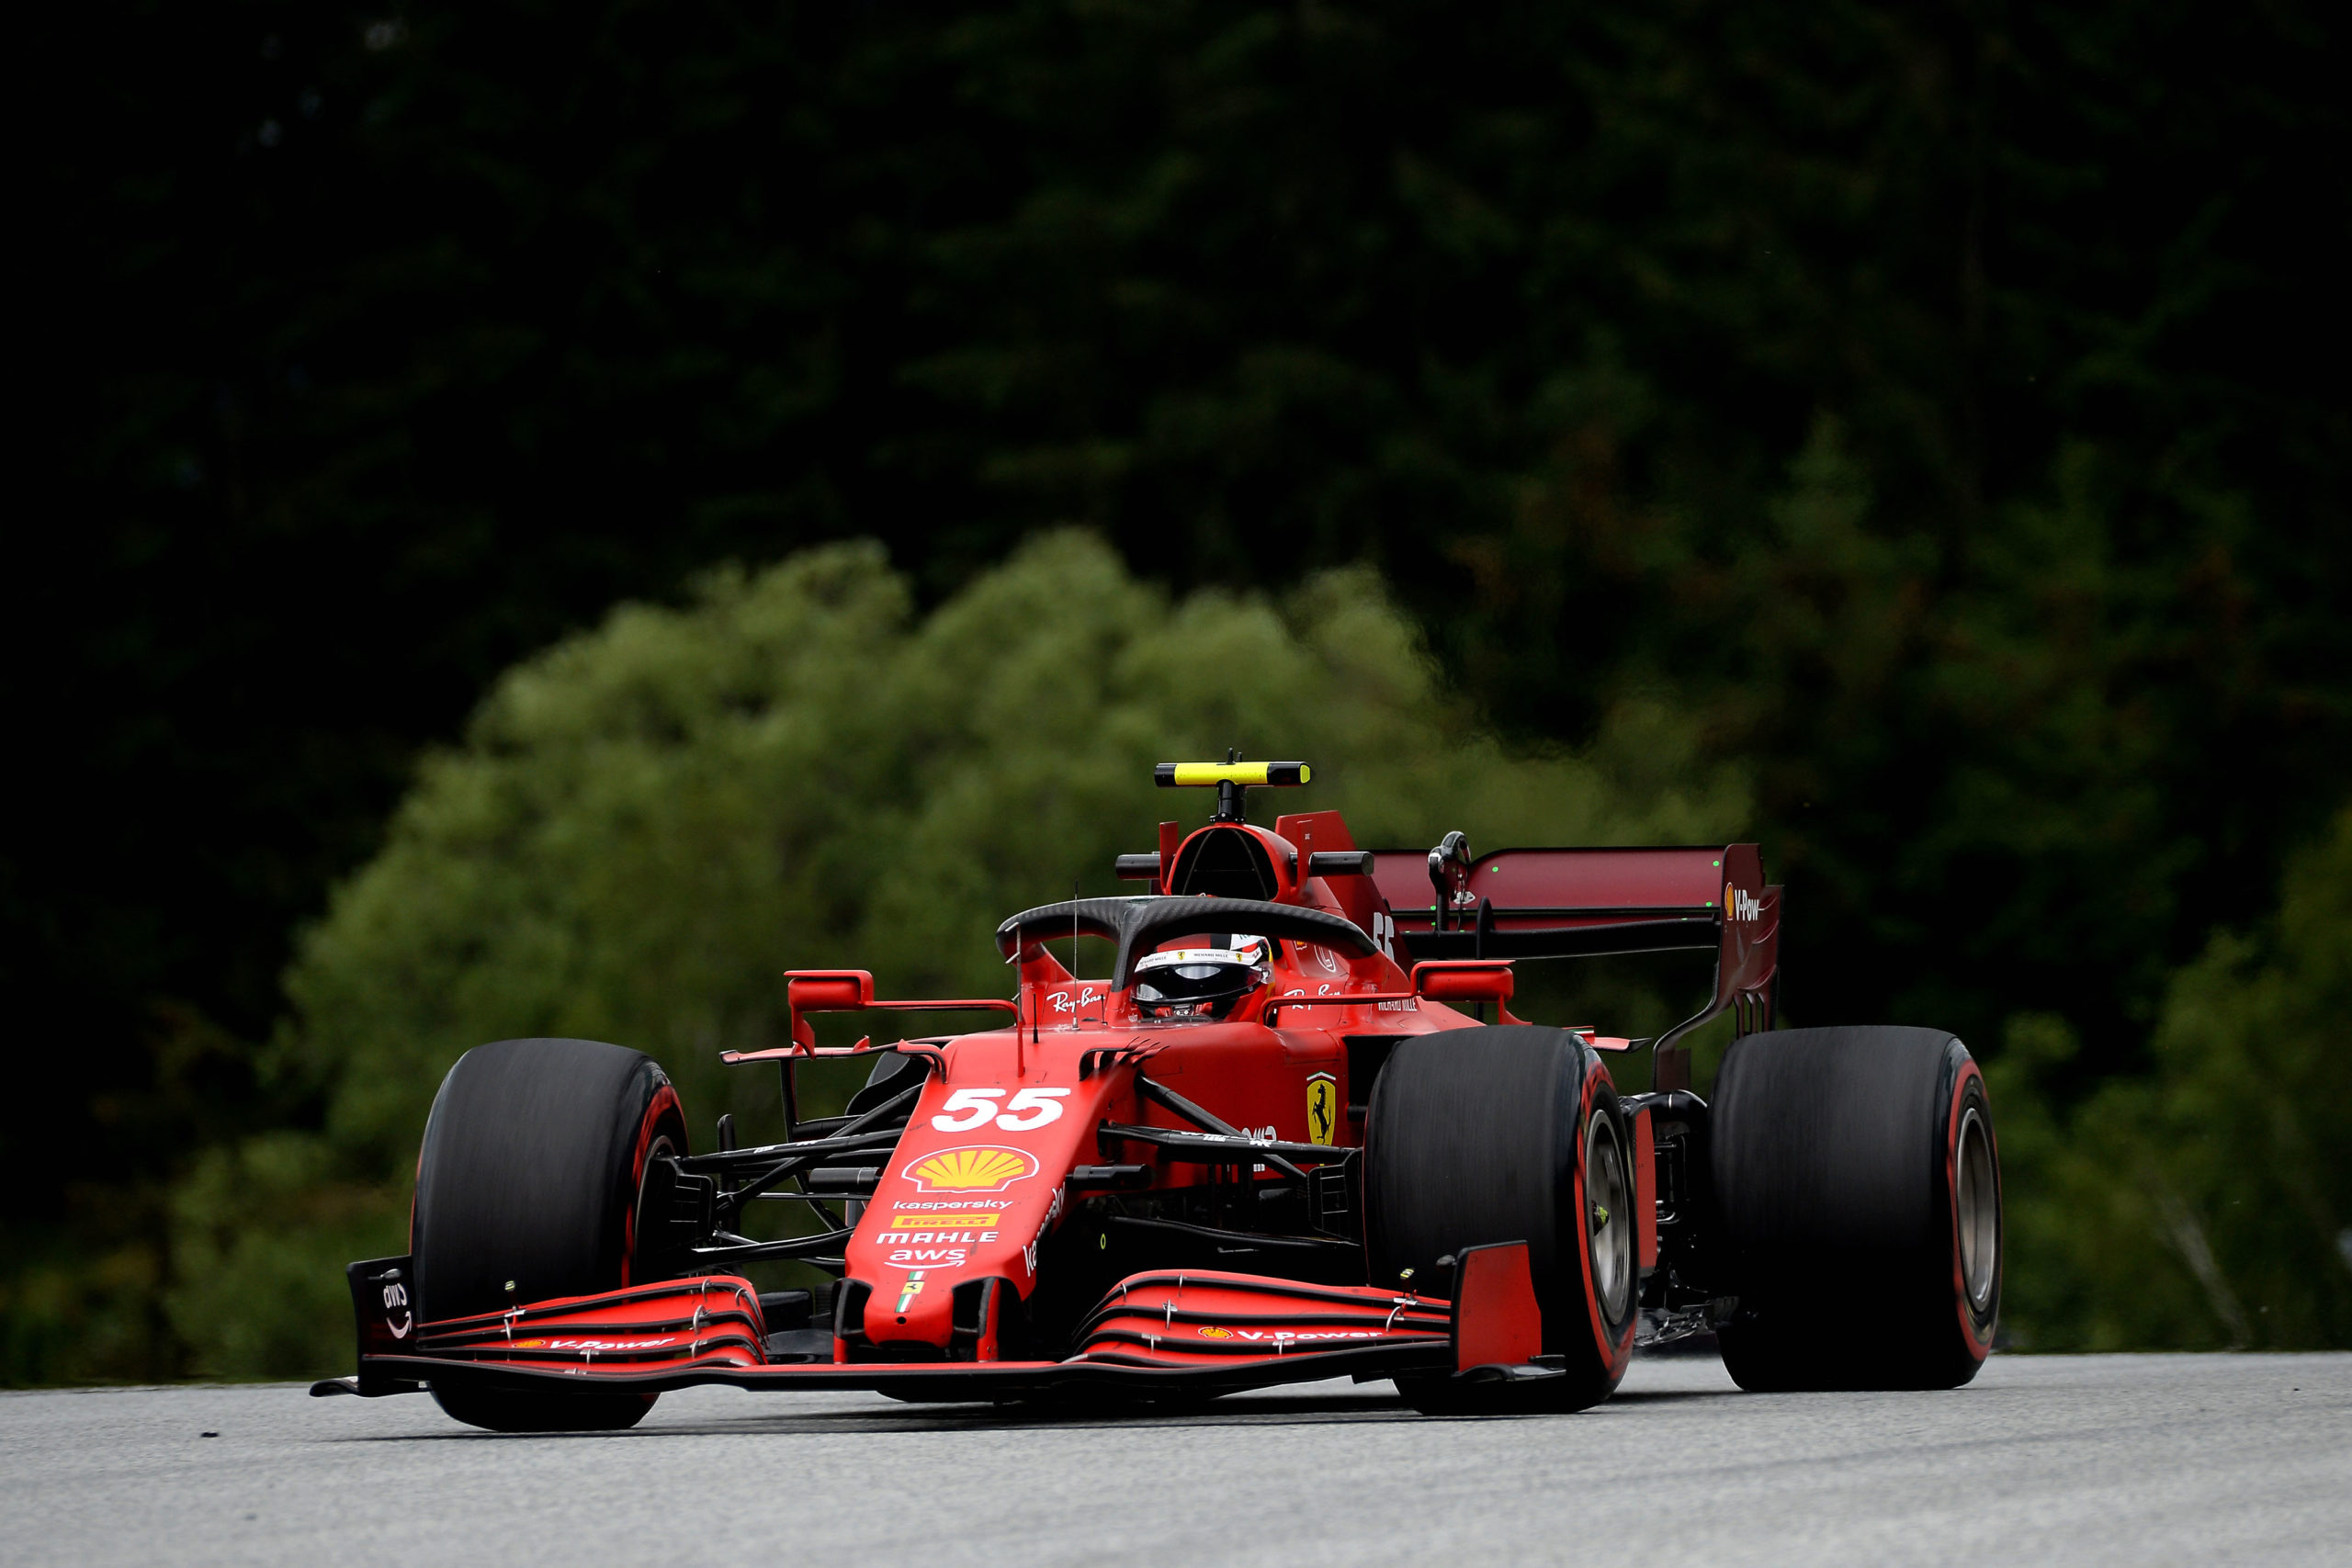 Carlos Sainz, Ferrari, GP AUSTRIA F1/2021 - VENERDI 02/07/2021   credit: @Scuderia Ferrari Press Office